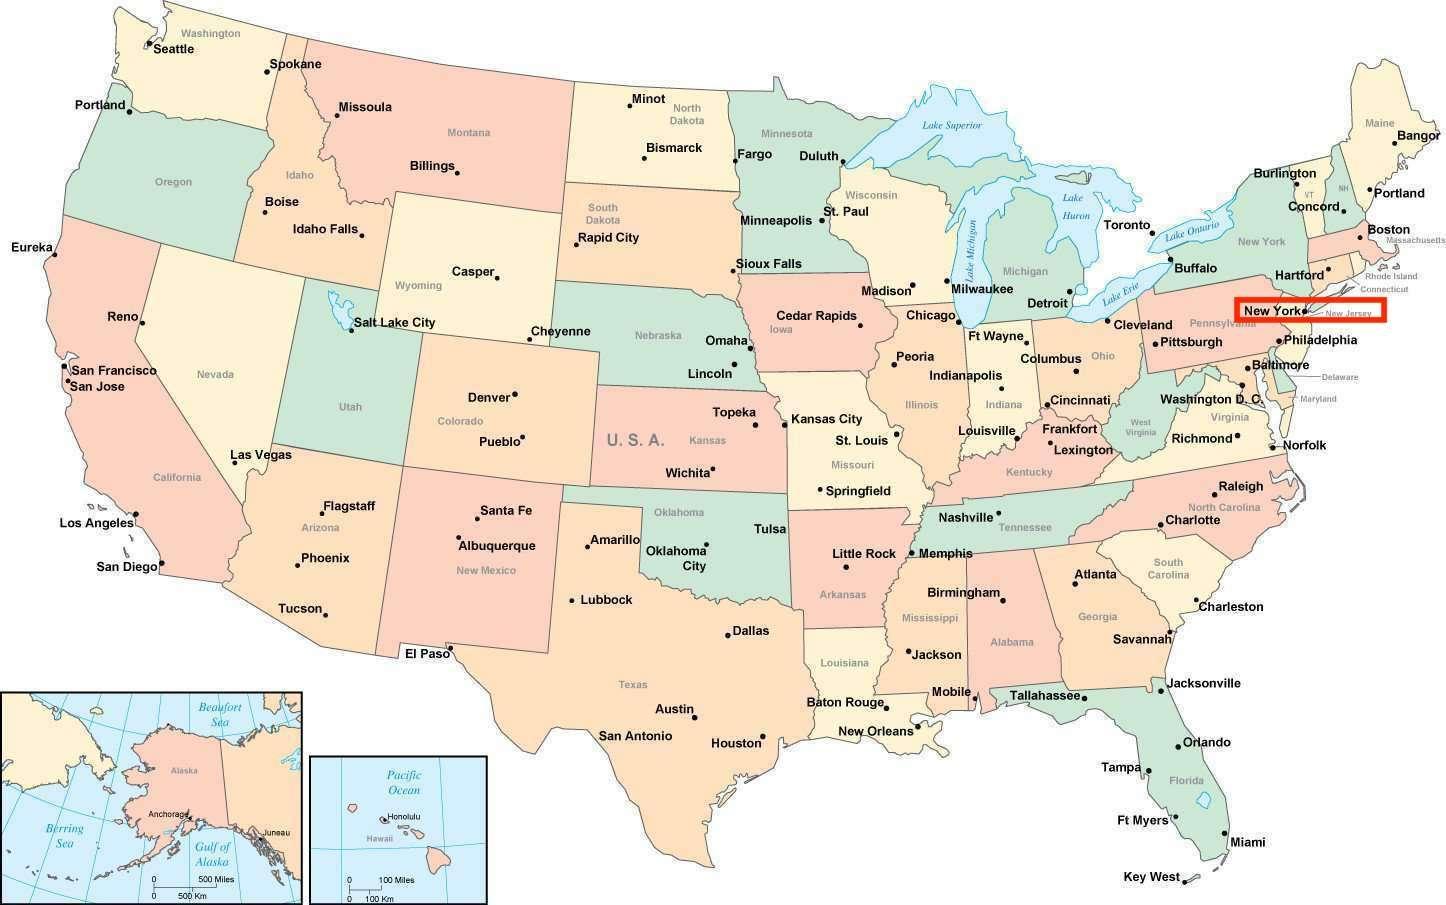 New York City On Map Of Usa.New York City On Map City Map New York New York Usa